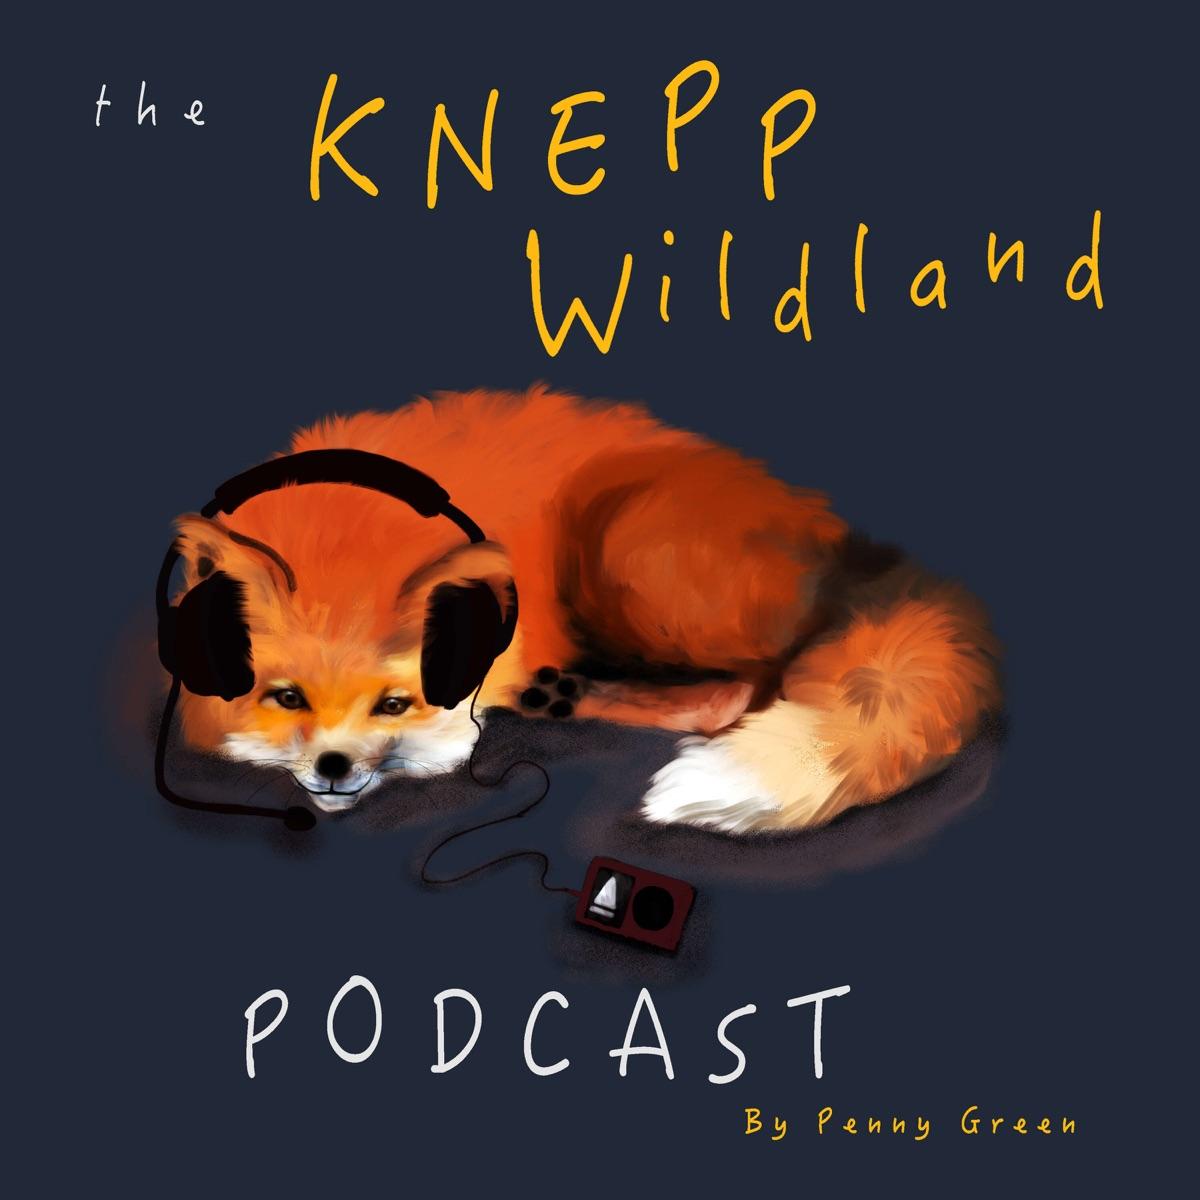 The Knepp Wildland Podcast